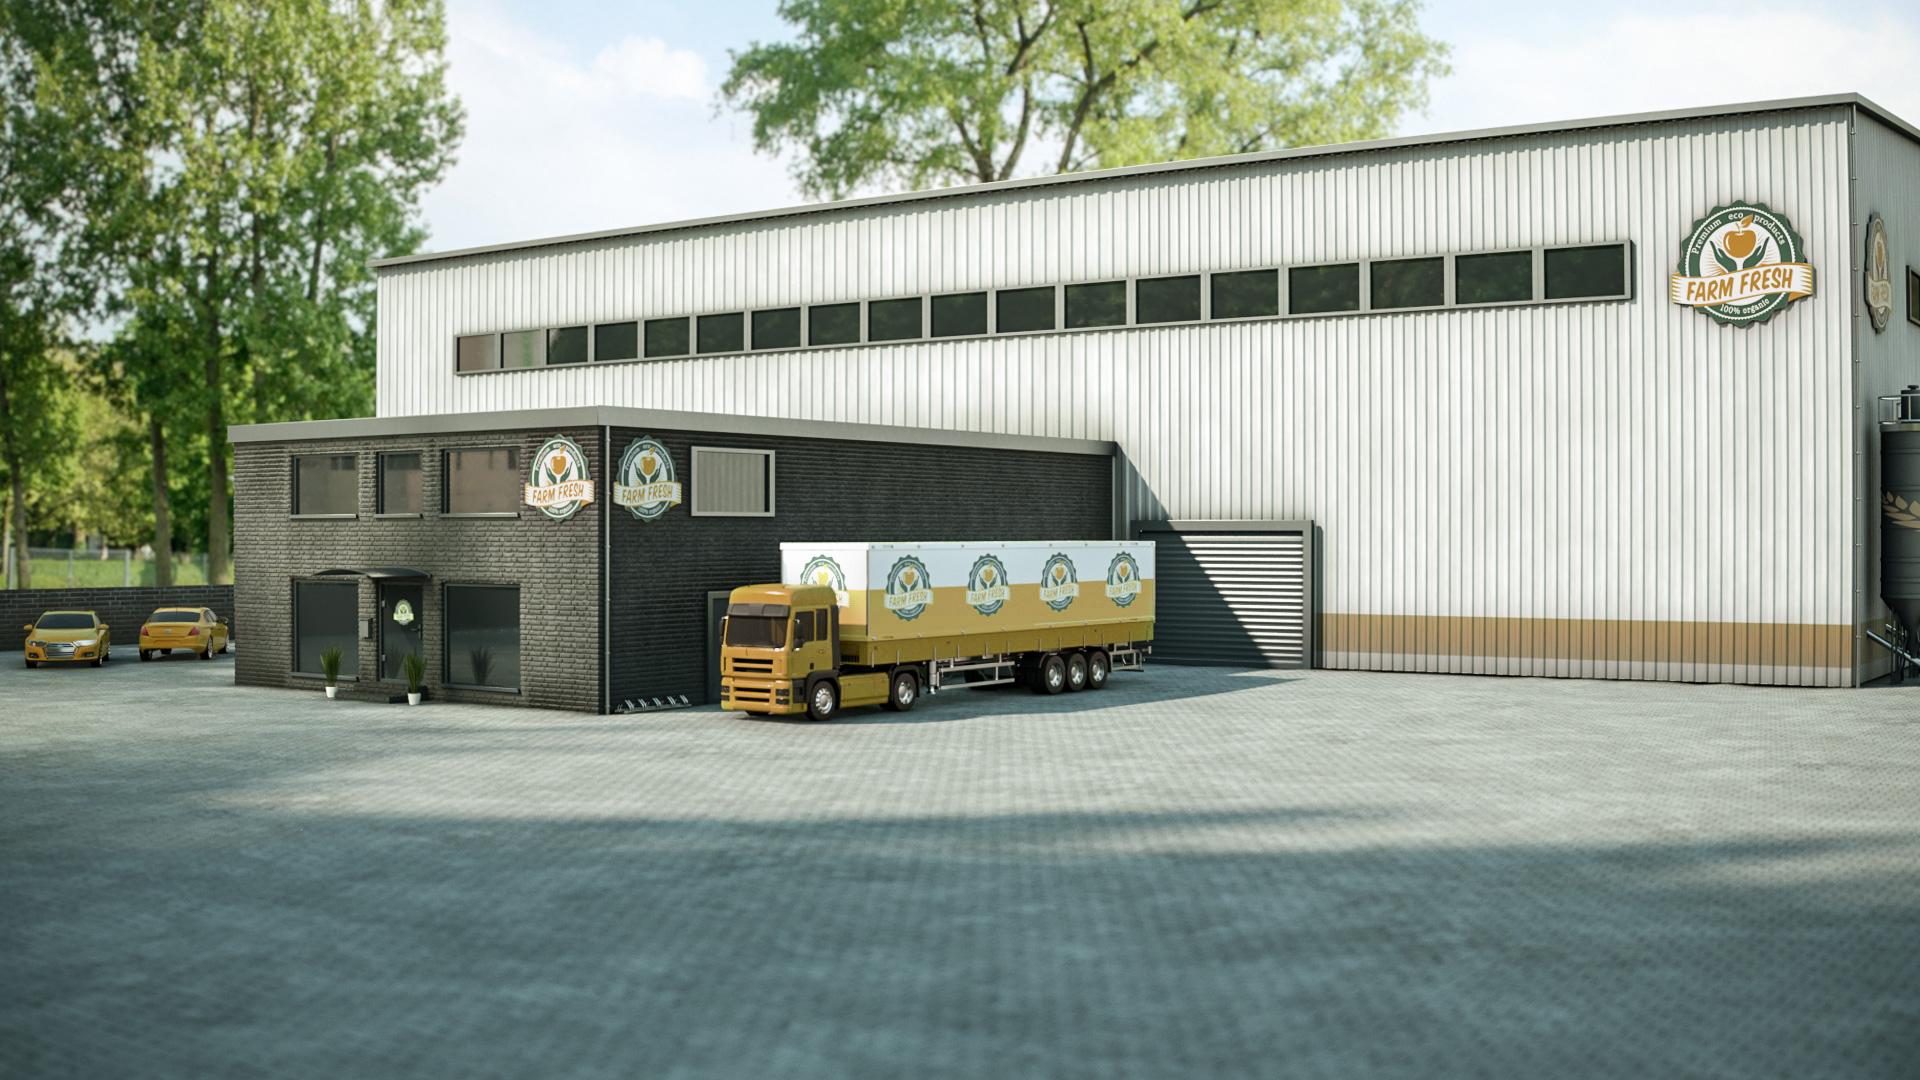 factory_03_farm-fresh_col-corr